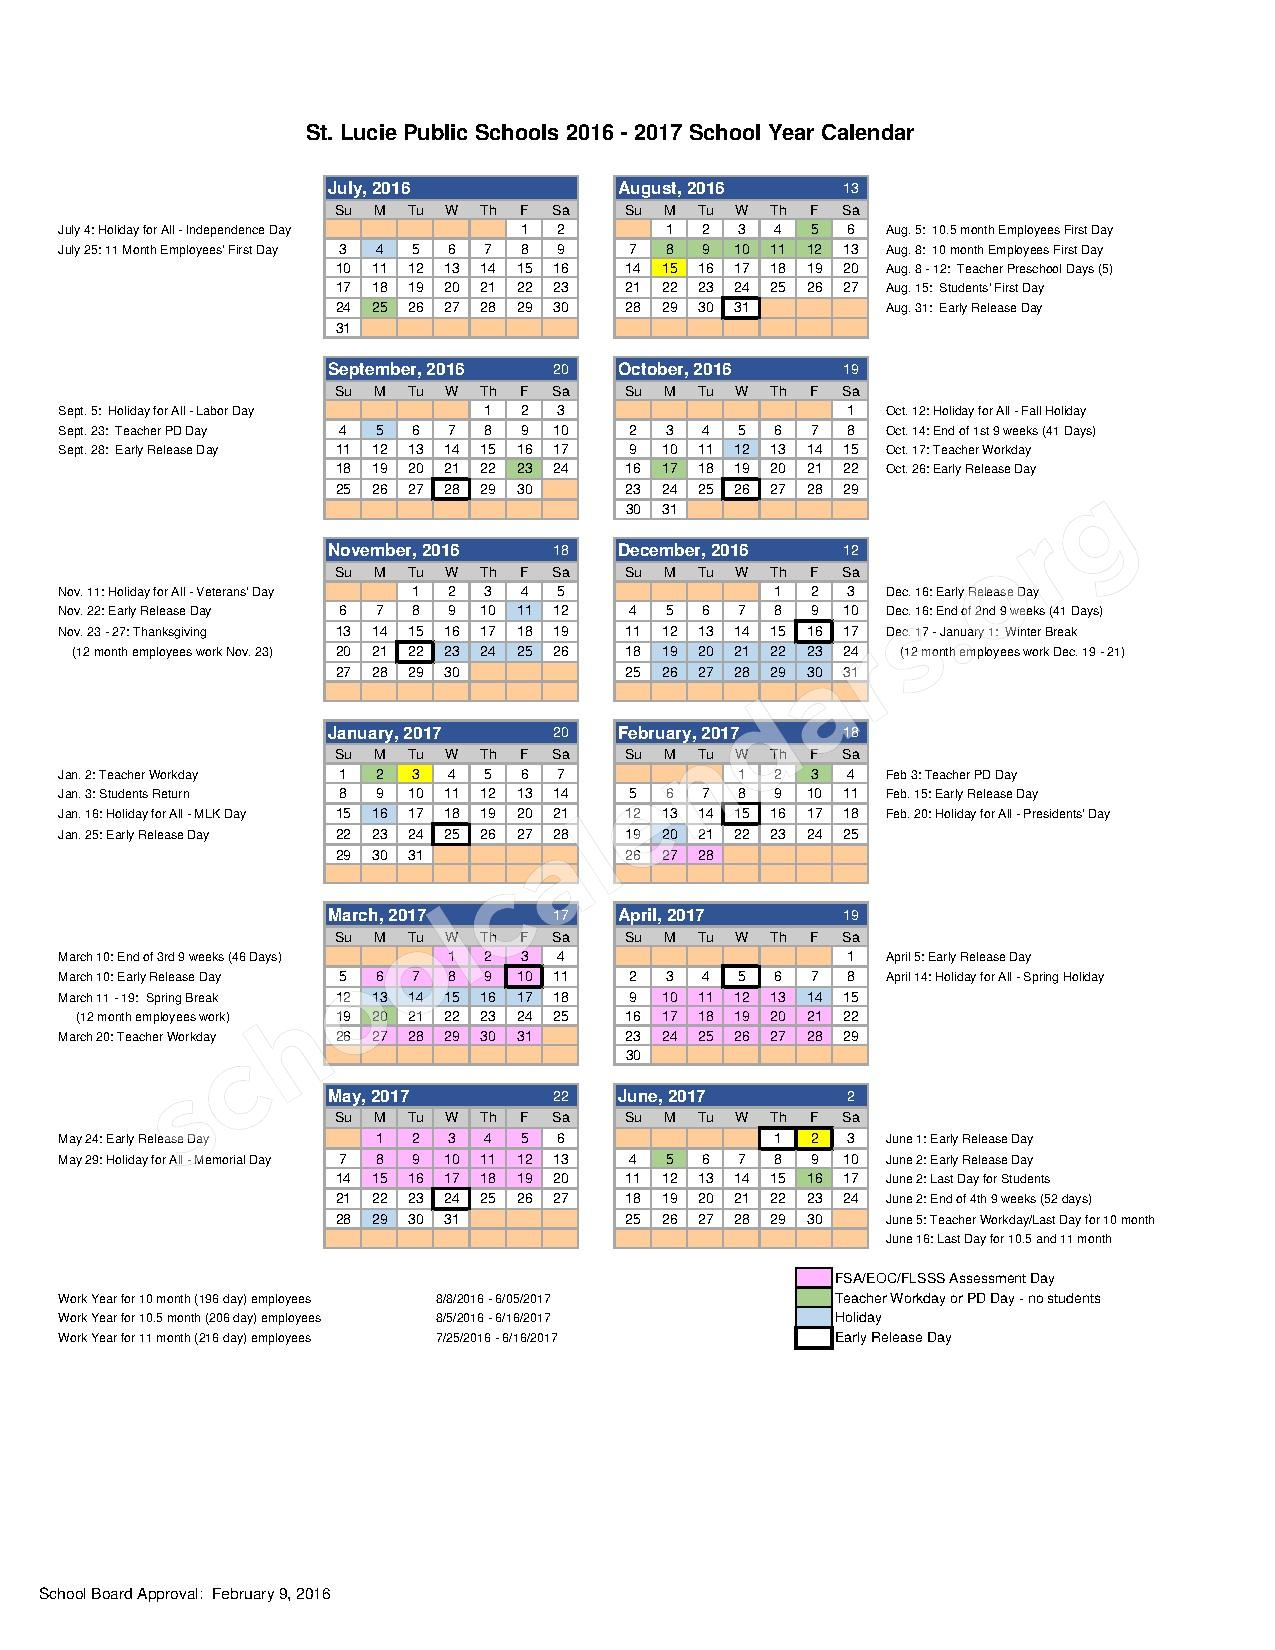 2016 - 2017 School Calendar | St. Lucie County School Intended For Port St Lucie School District Calendar